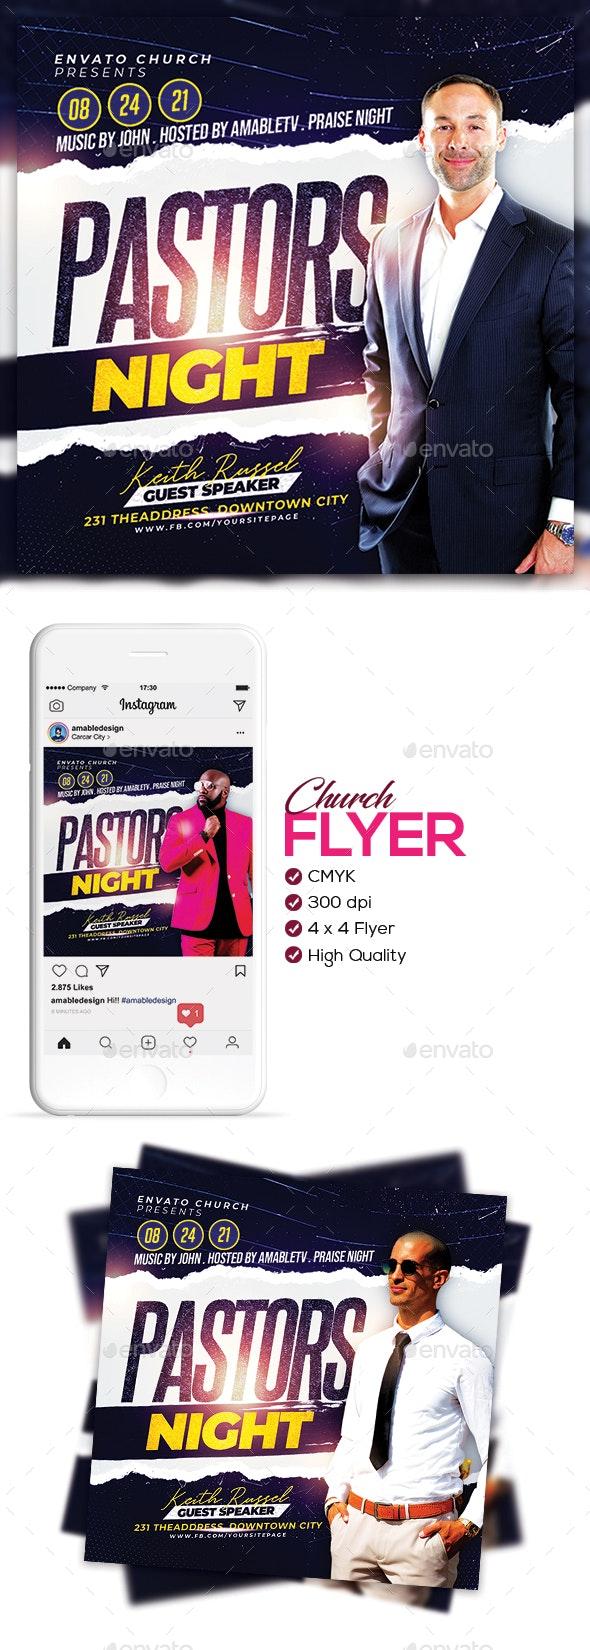 Pastor's Night Church Flyer/Poster - Church Flyers